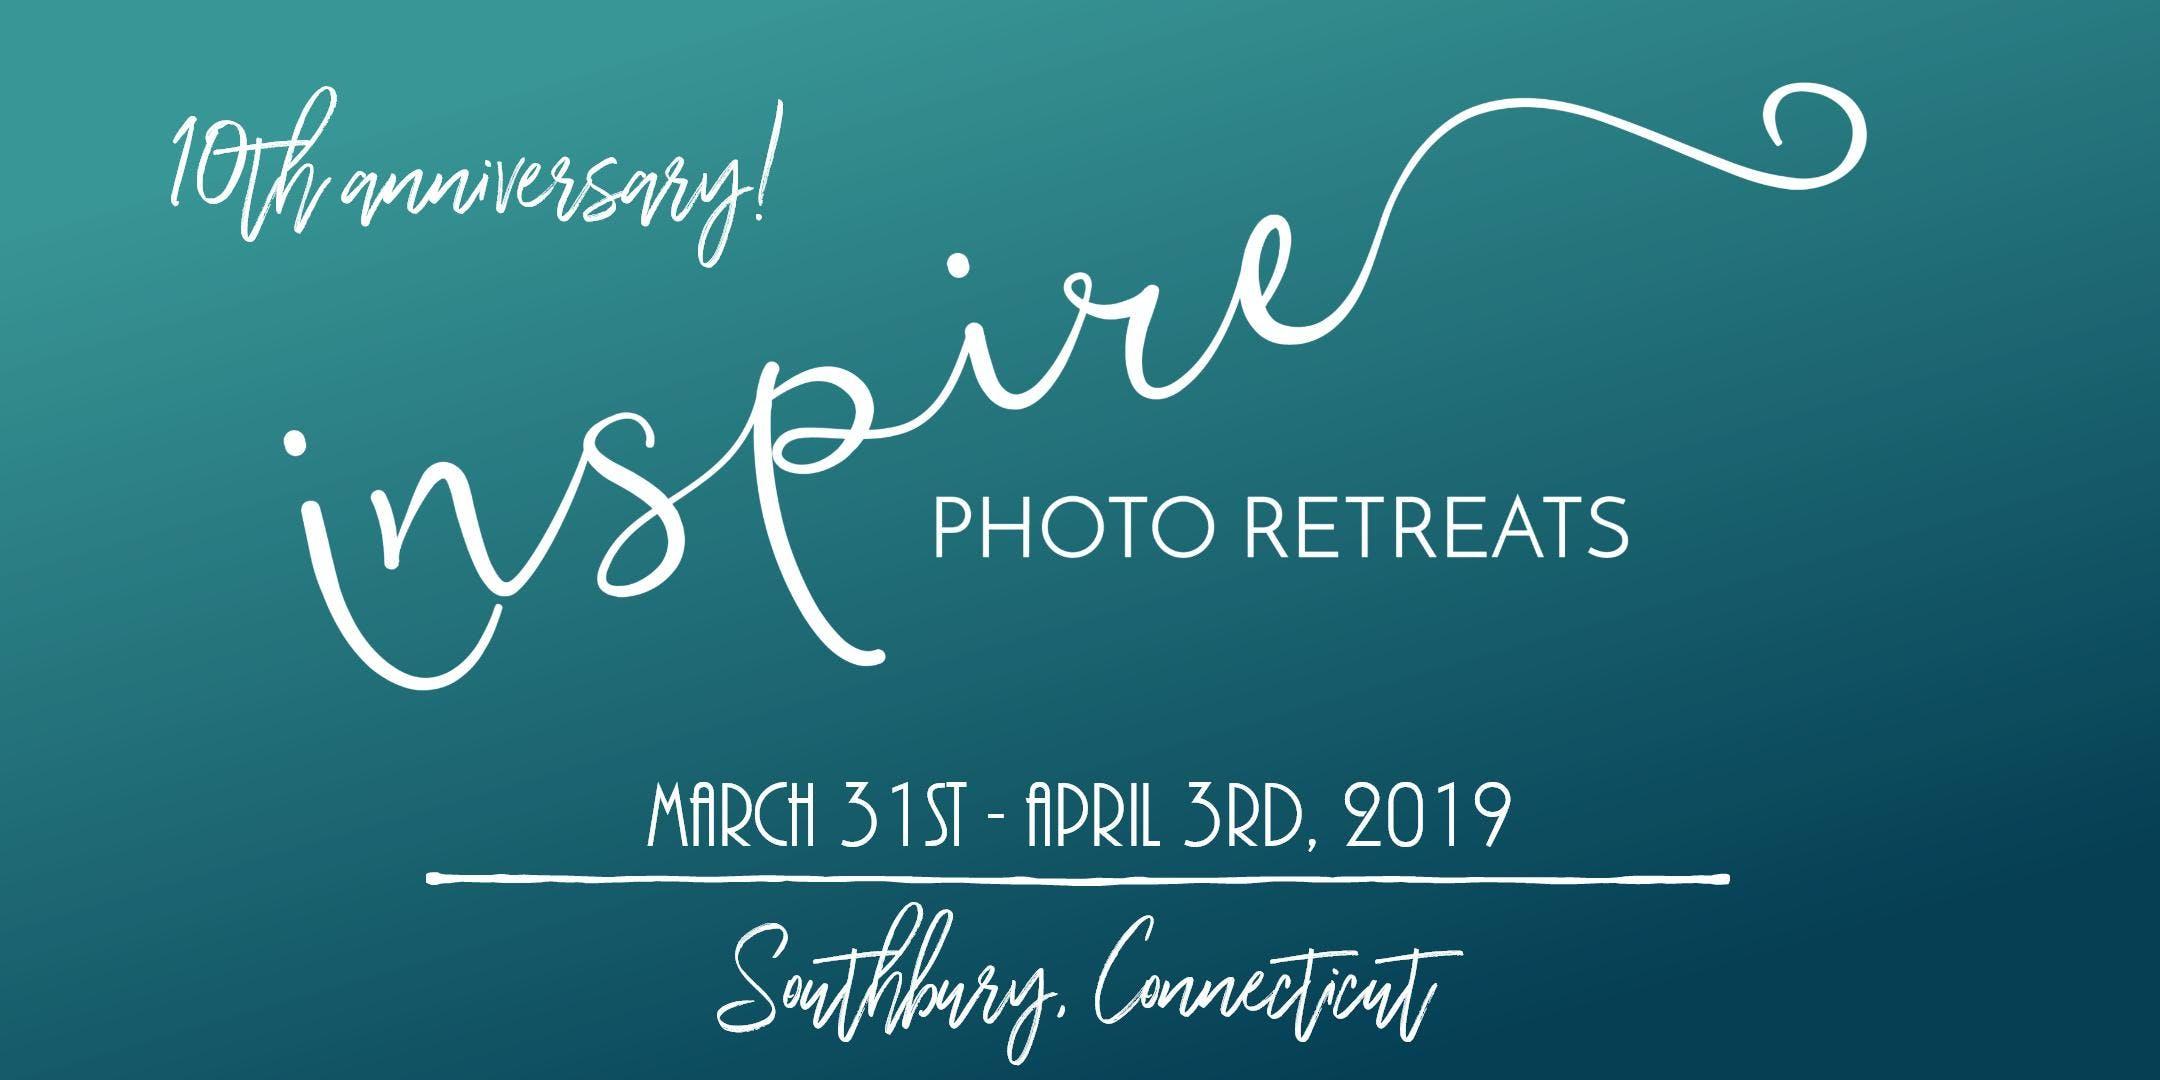 10th Anniversary Inspire Photo Retreats - 201